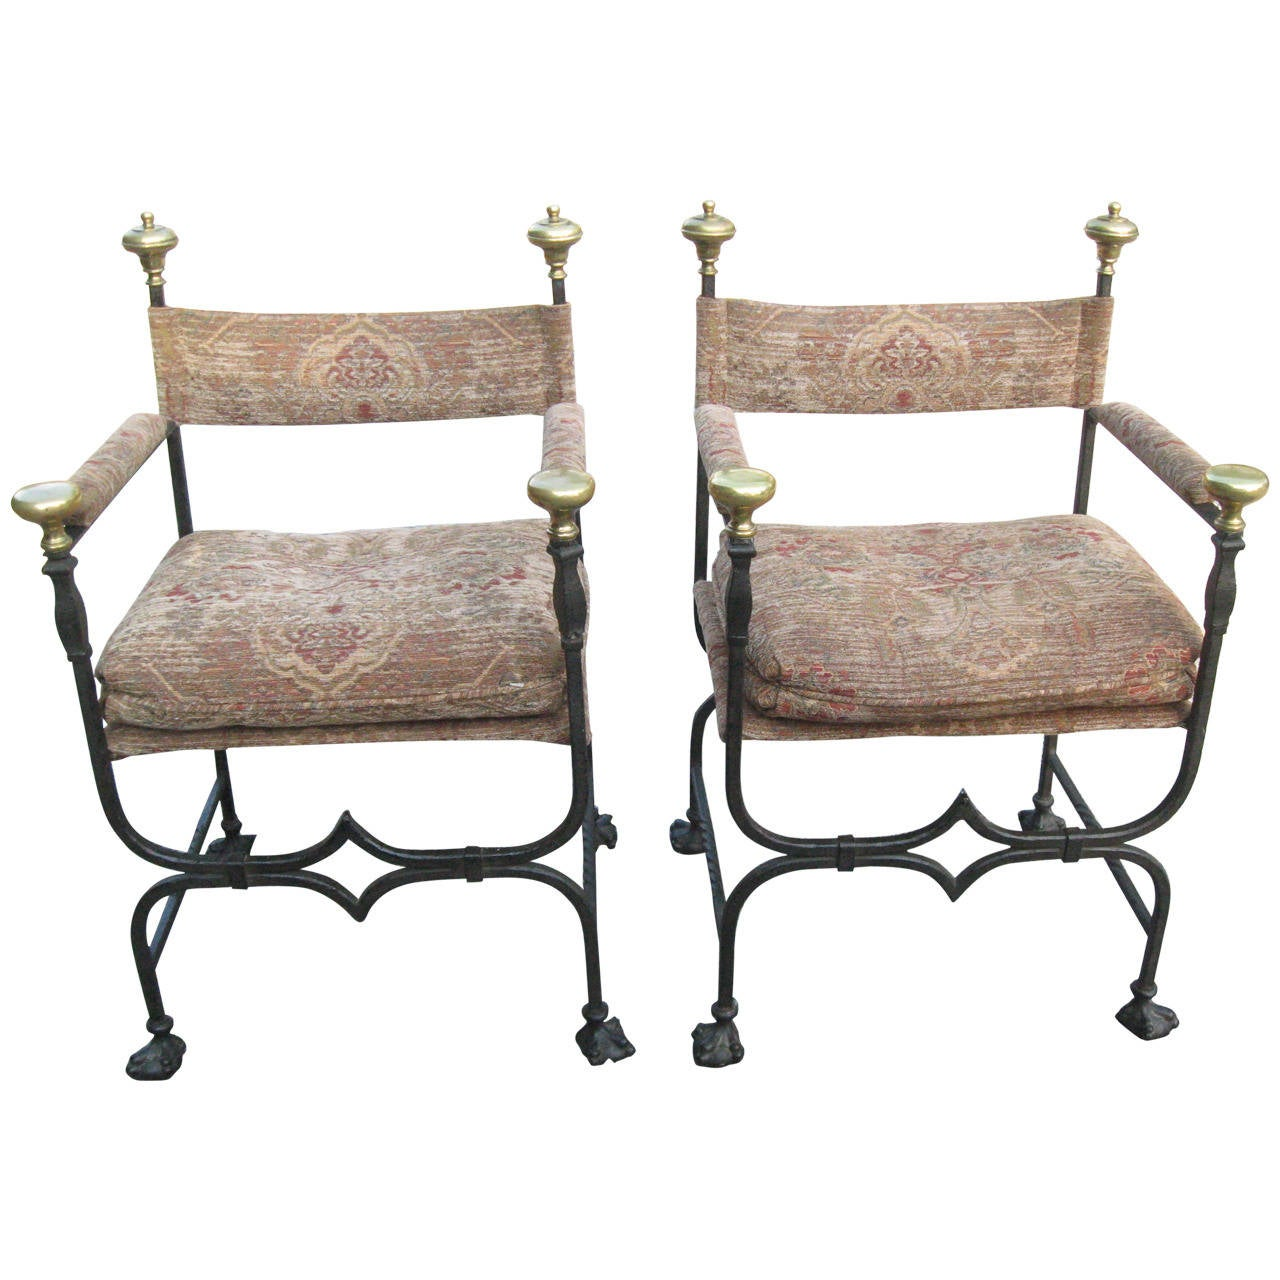 19th Century Italian Savonarola Chairs